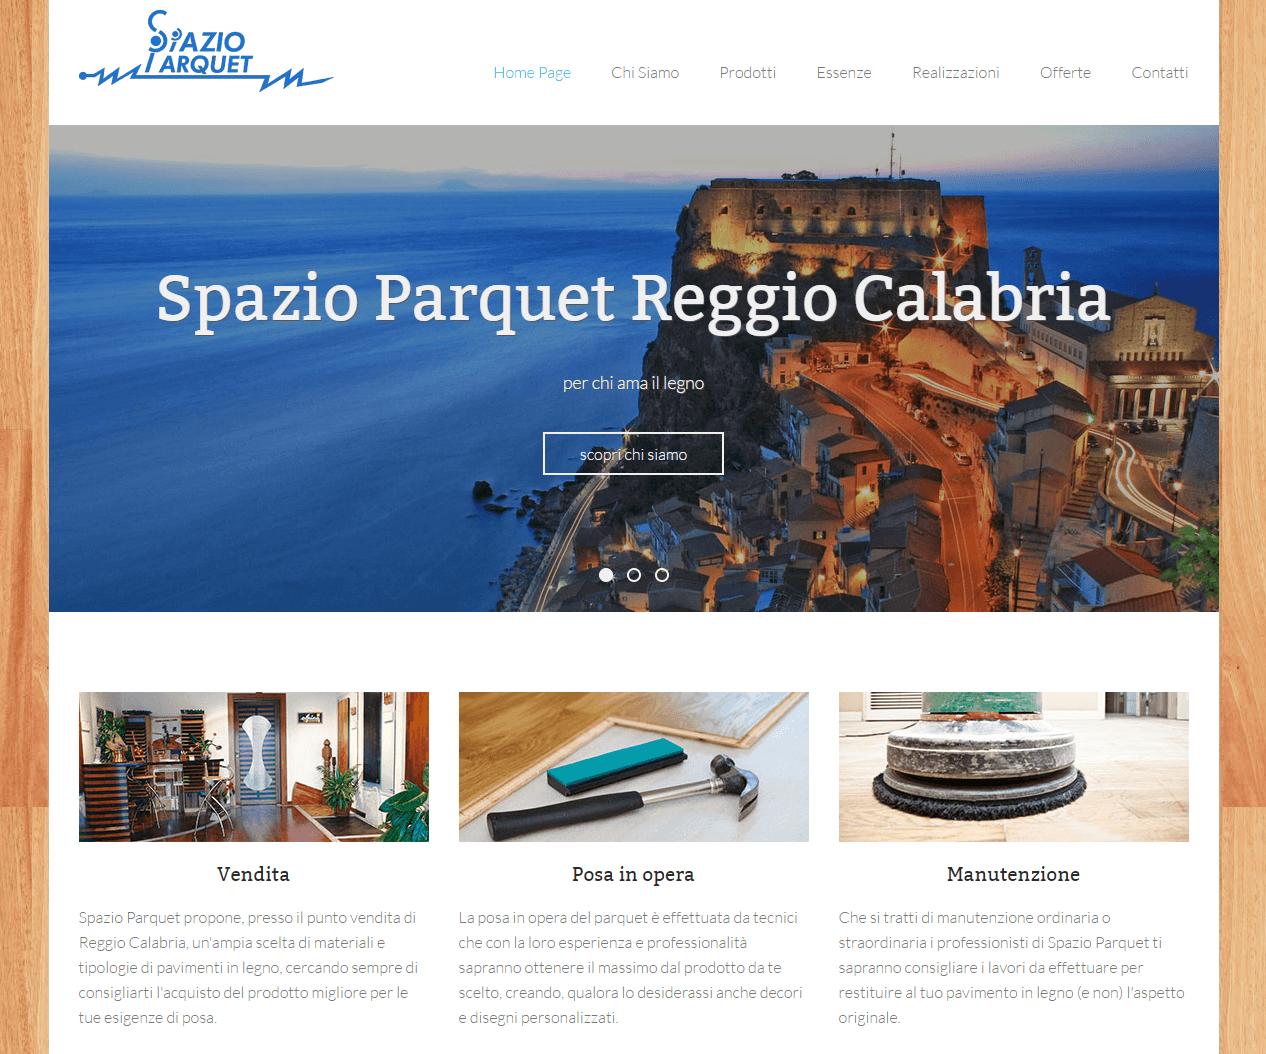 Spazio Parquet - Parte alta Home Page